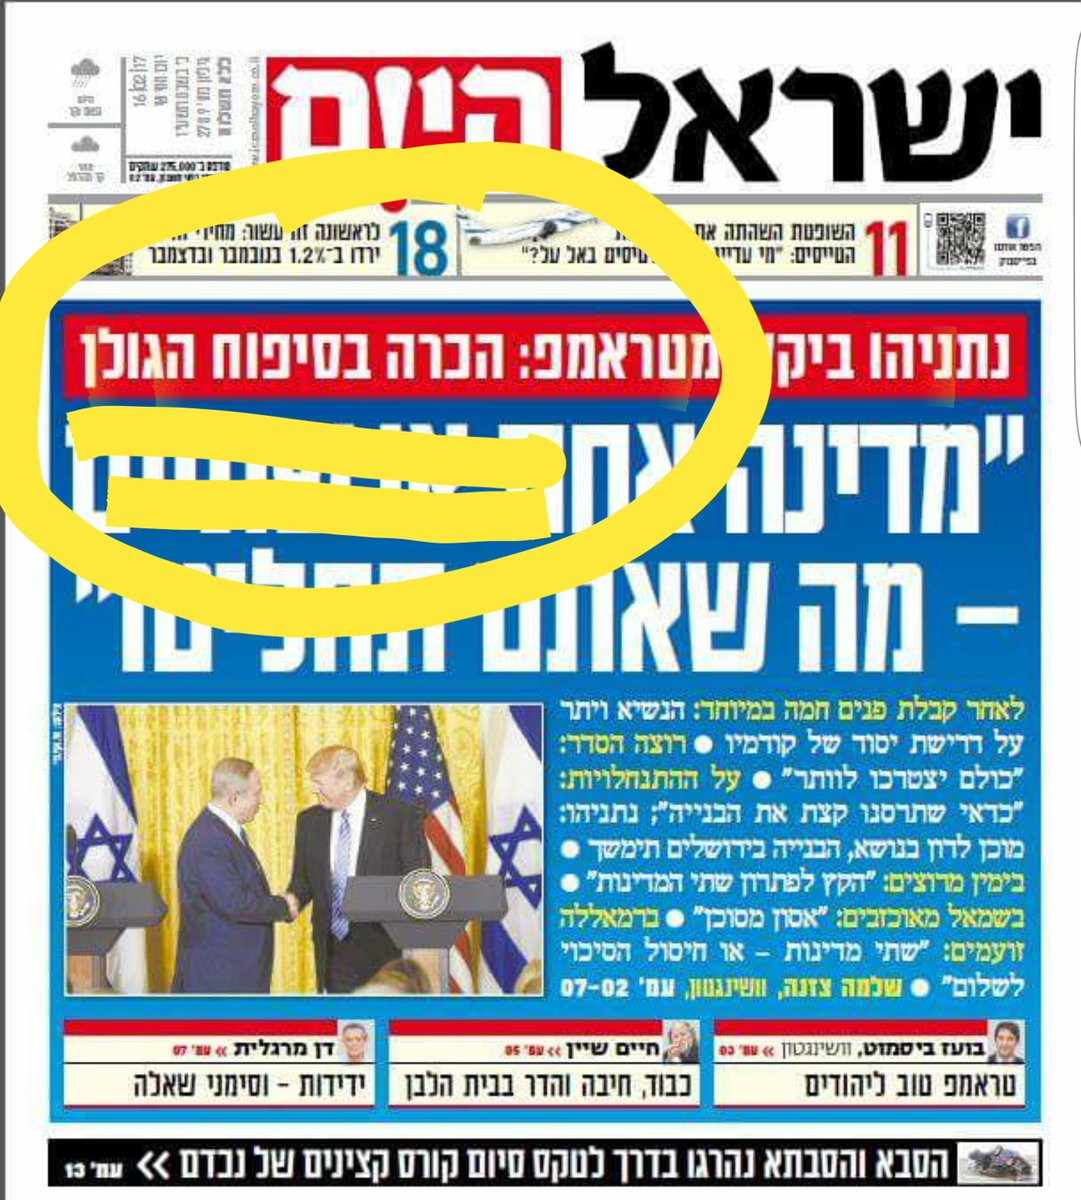 #Netanyahu: Netanyahu